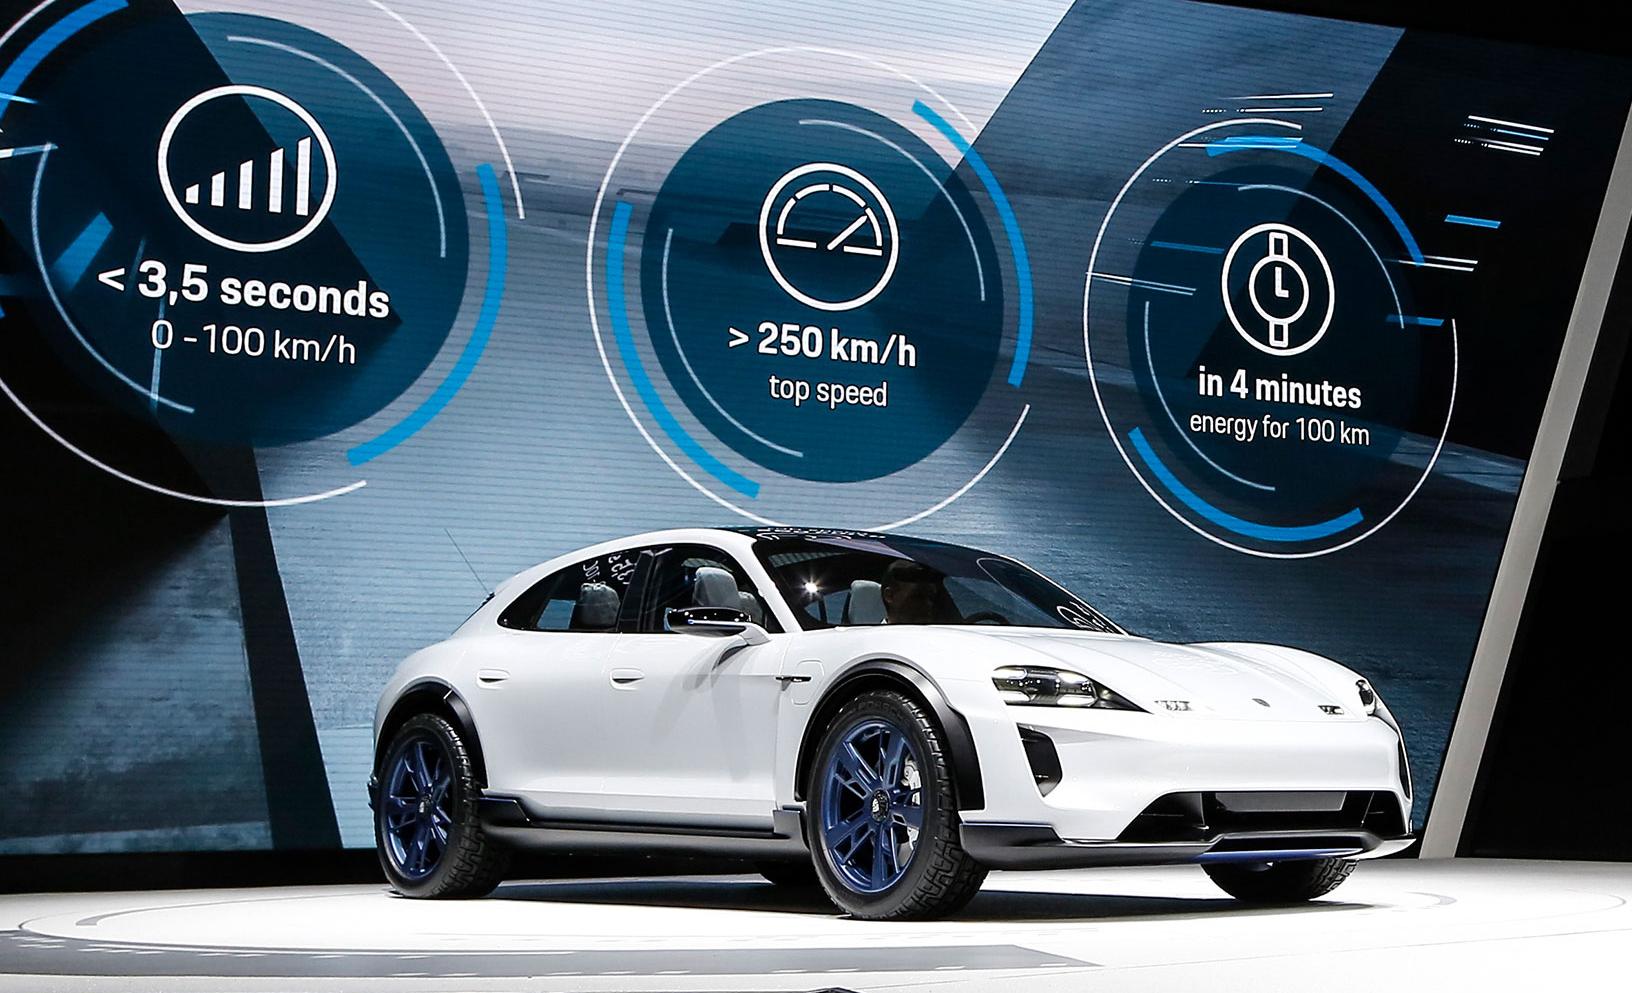 Porsche Mission E Cross Turismo Concept Ev Gaya Seperti